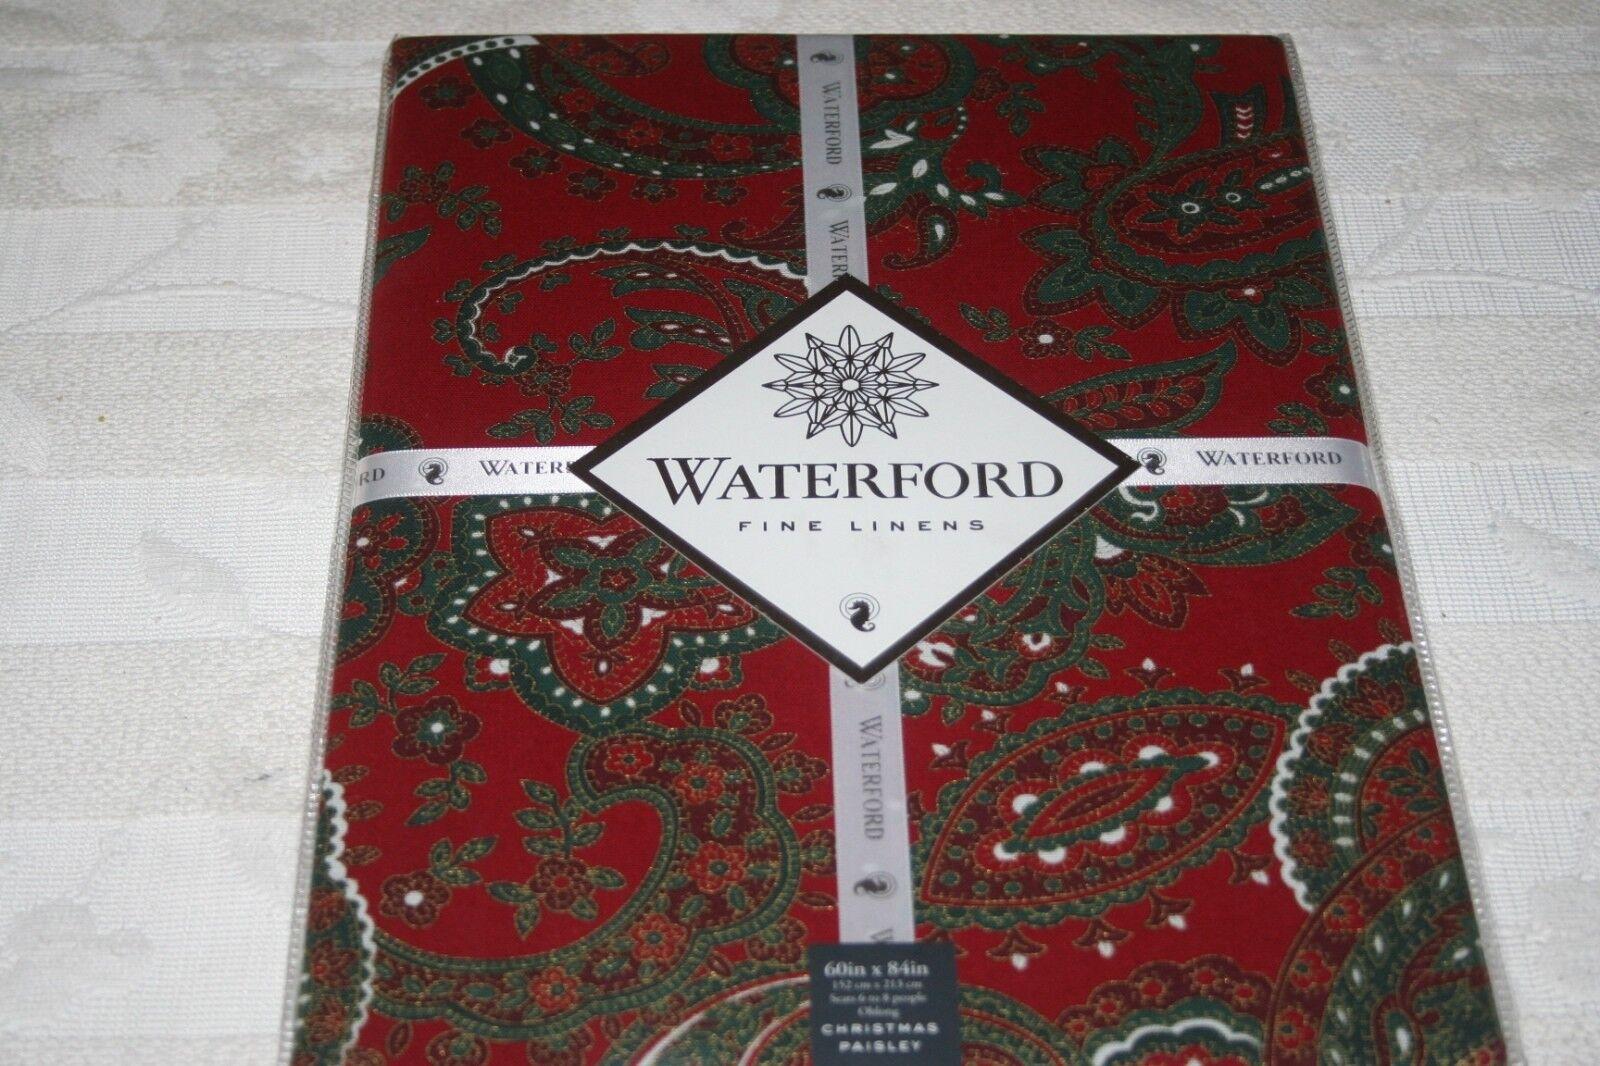 Waterford fine Linens Christmas Paisley tovaglia rosso verde oro 152 x 213 cm